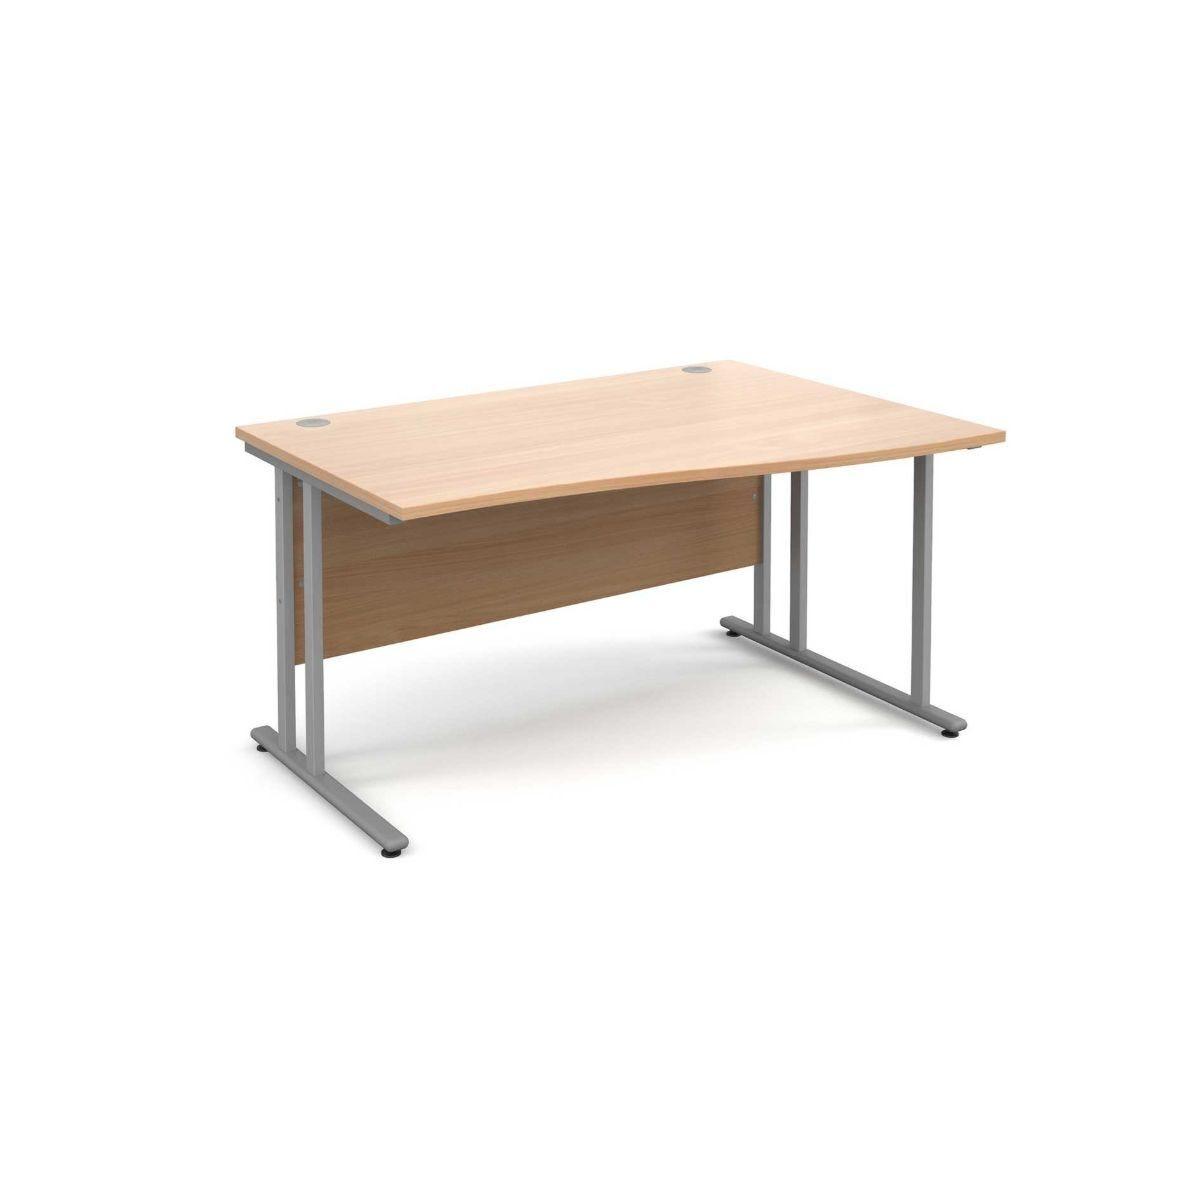 Maestro 25 Right Hand Wave 1400 Desk with Silver Legs